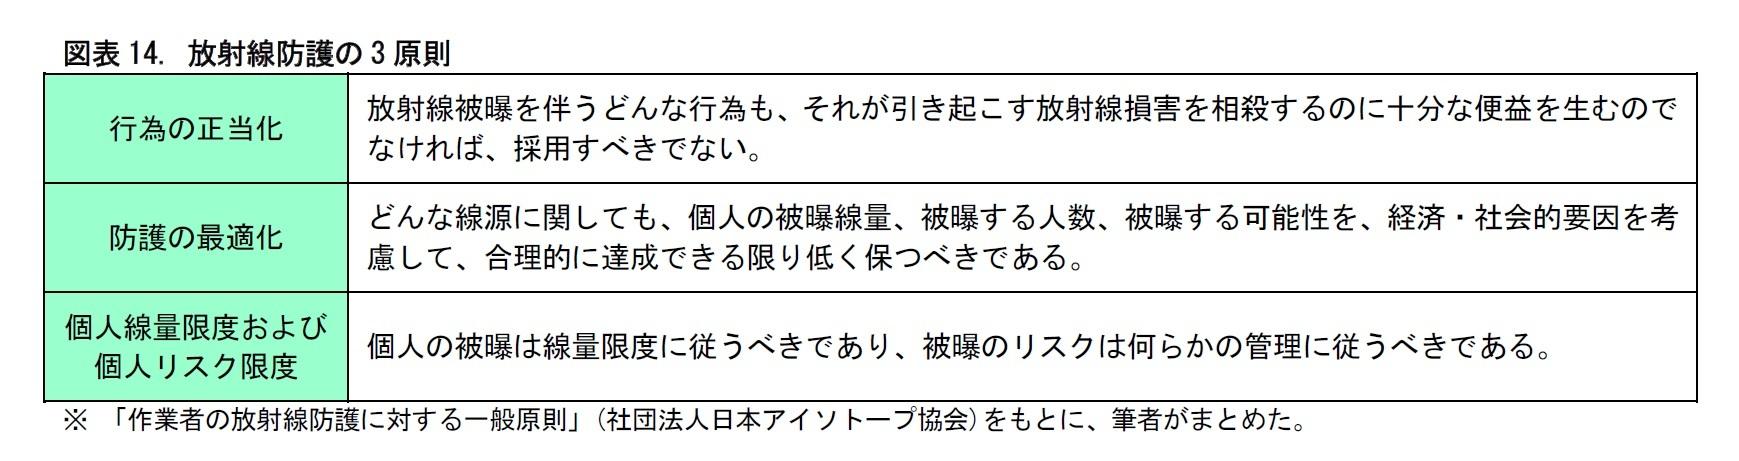 図表14. 放射線防護の3 原則